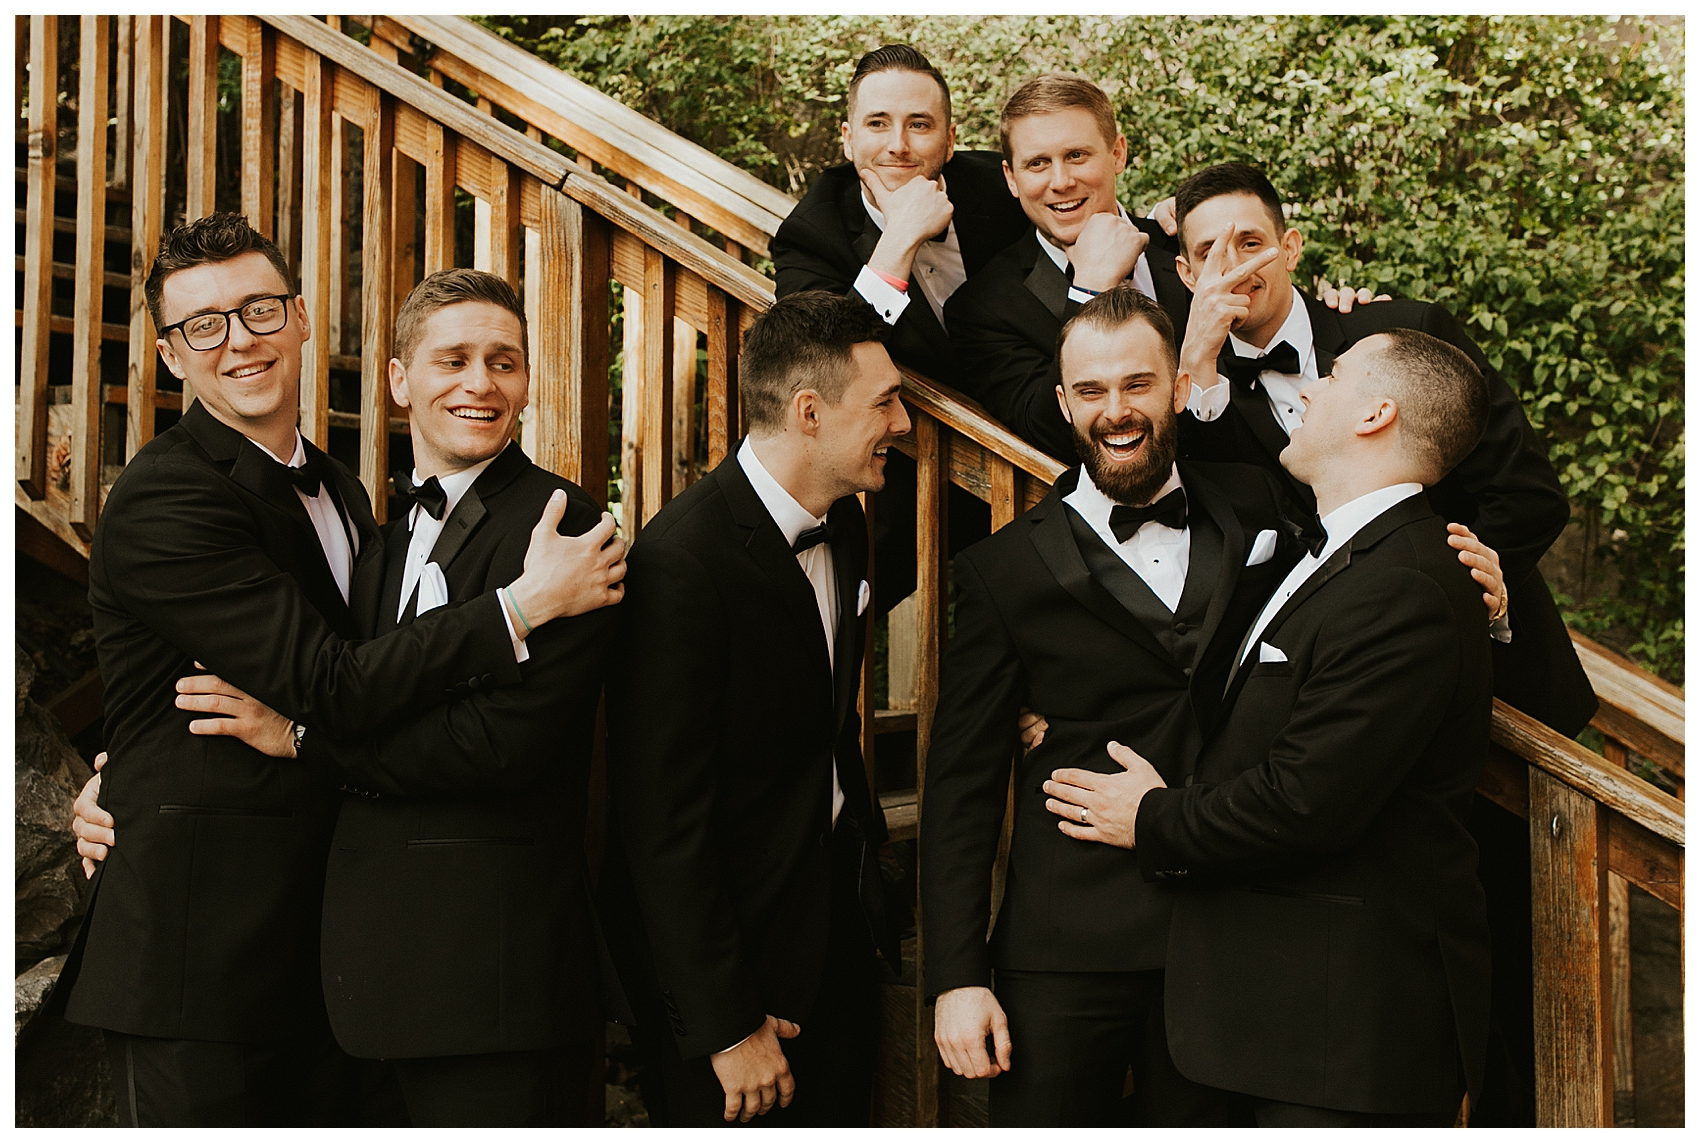 Chateau Rive Spokane Wedding Cassie Trottier Photography01025.jpg